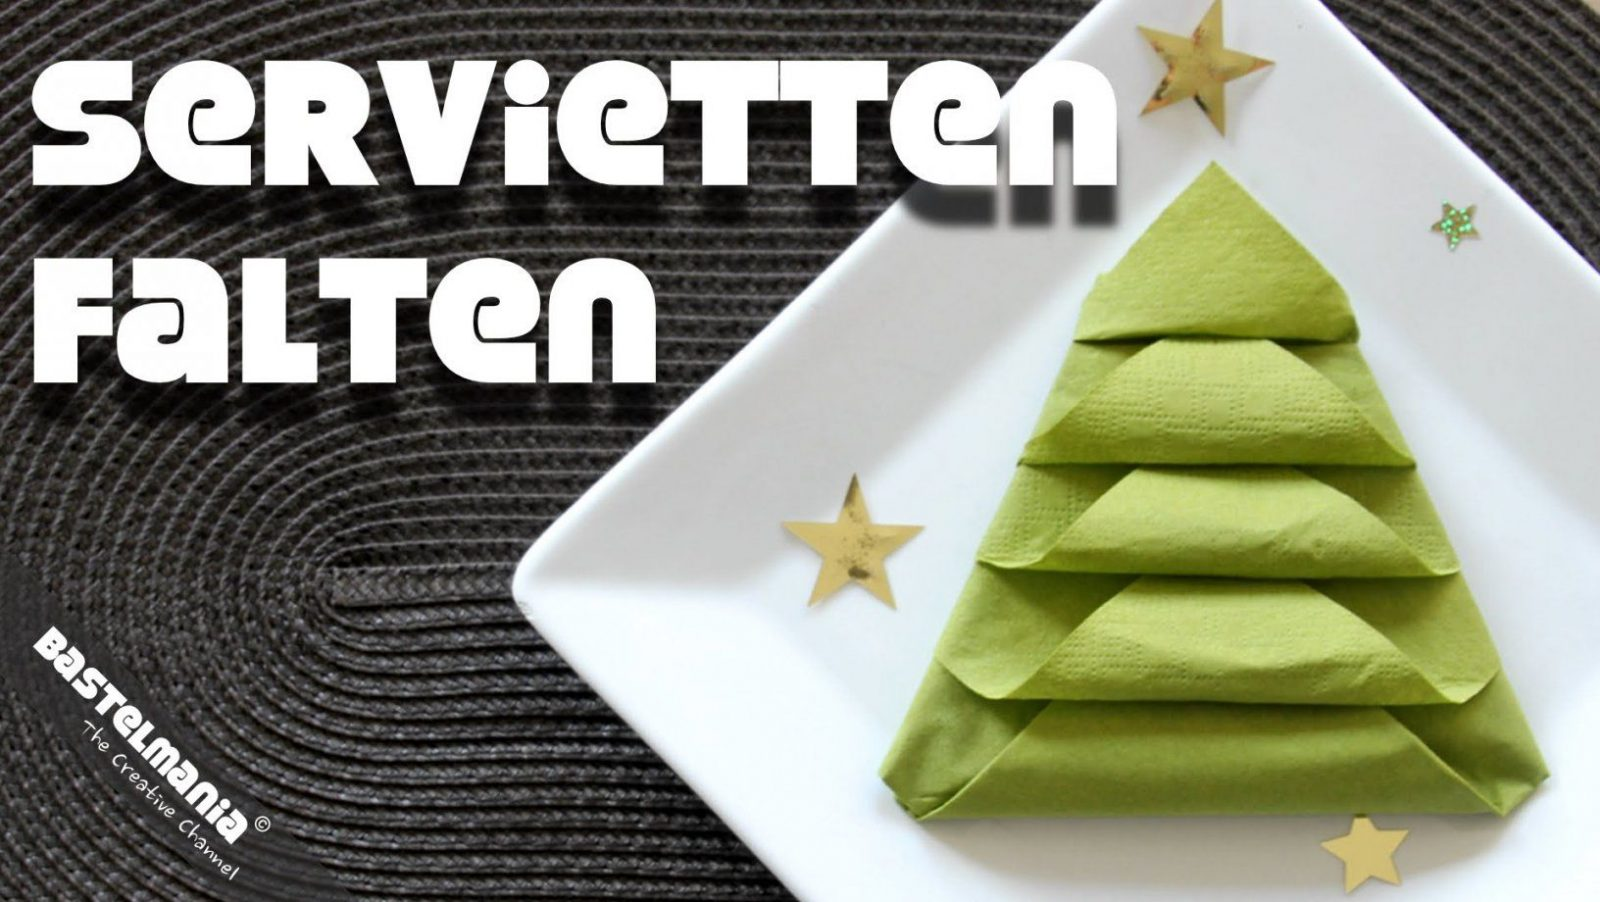 Servietten Falten Anleitung Tannenbaum Weihnachten Diy Napkin von Serviette Als Tannenbaum Falten Photo